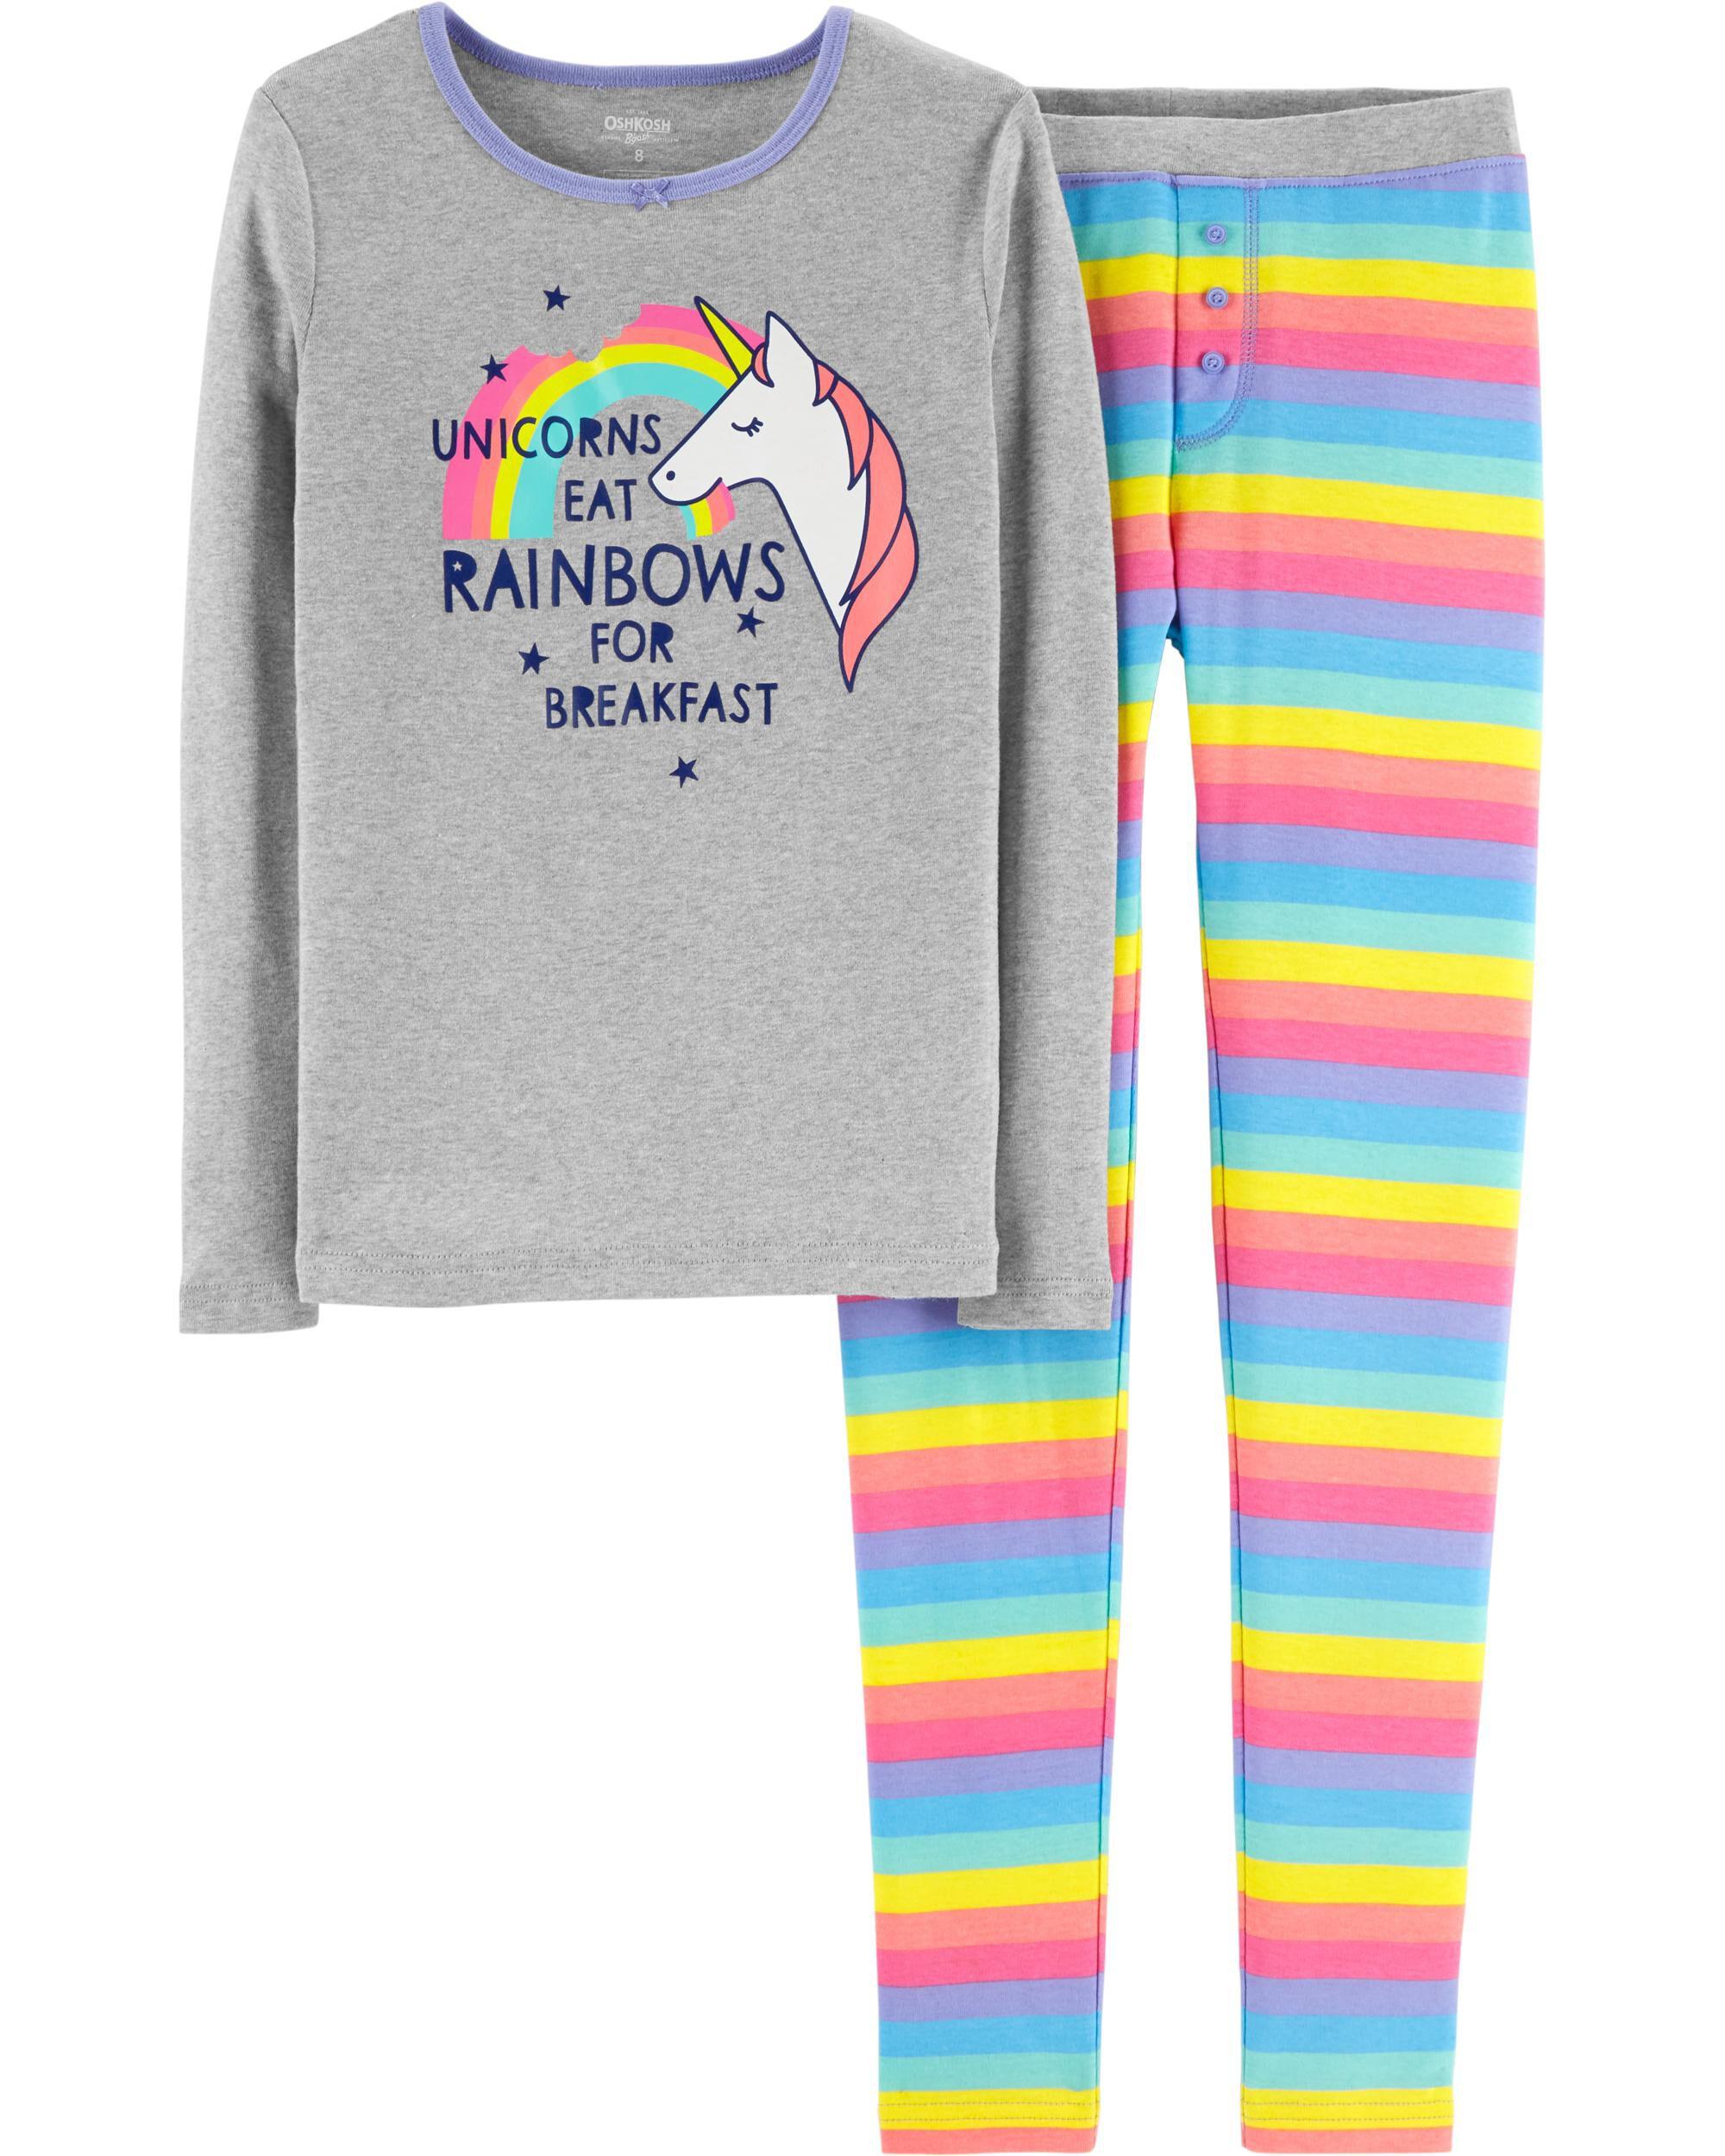 f1717e6ef9f2 Snug Fit Rainbow Unicorn Cotton PJs